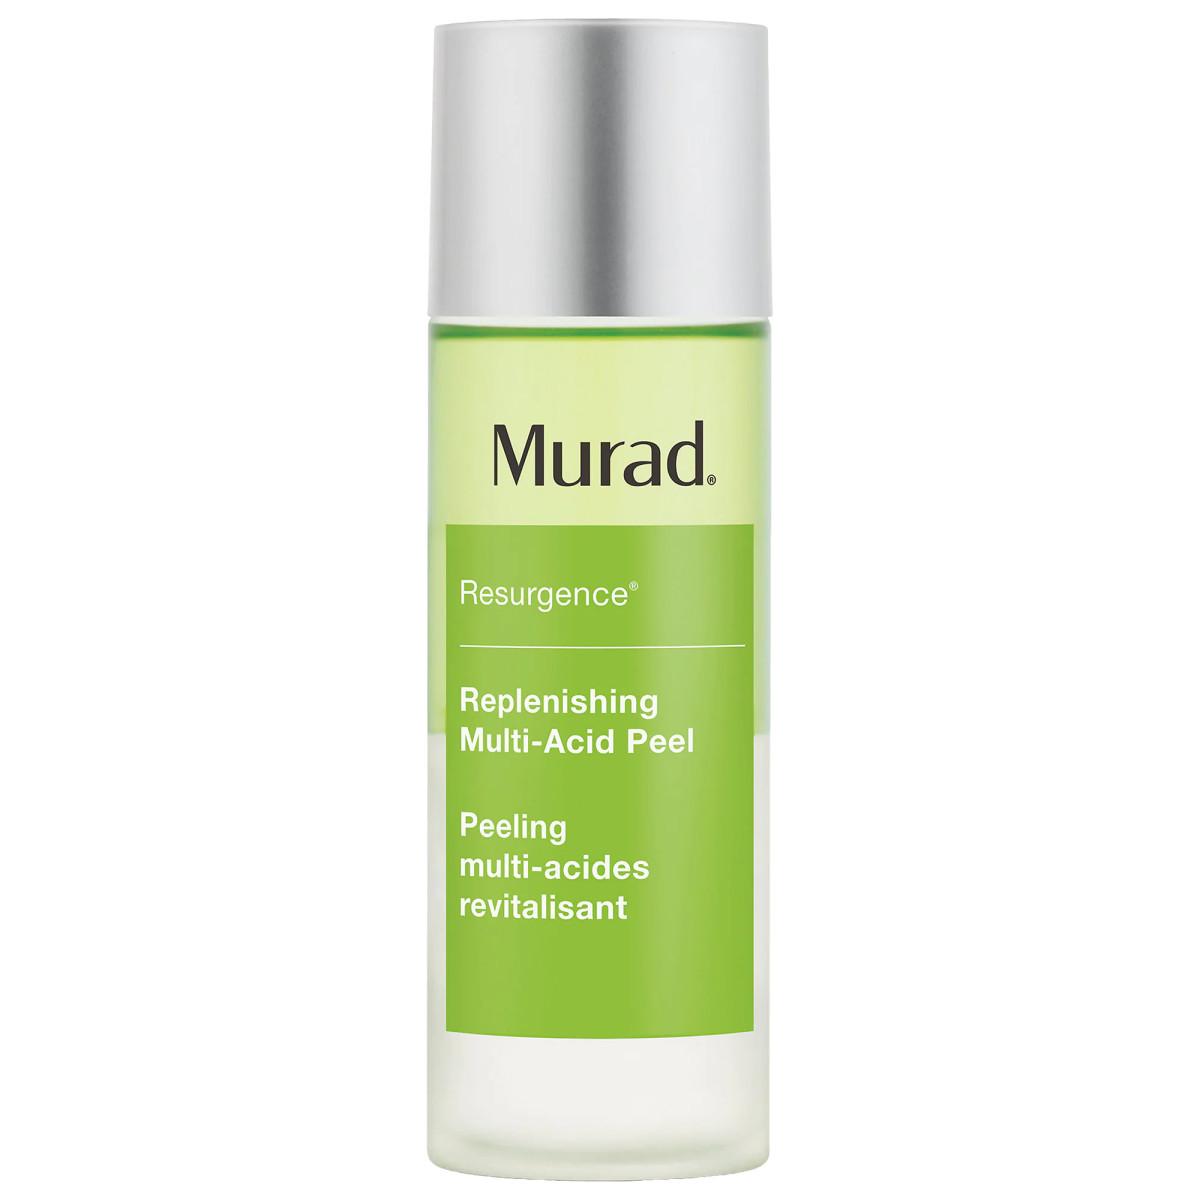 Murade Replenishing Multi-Acid Peel – so, so, good. Saw results fast!